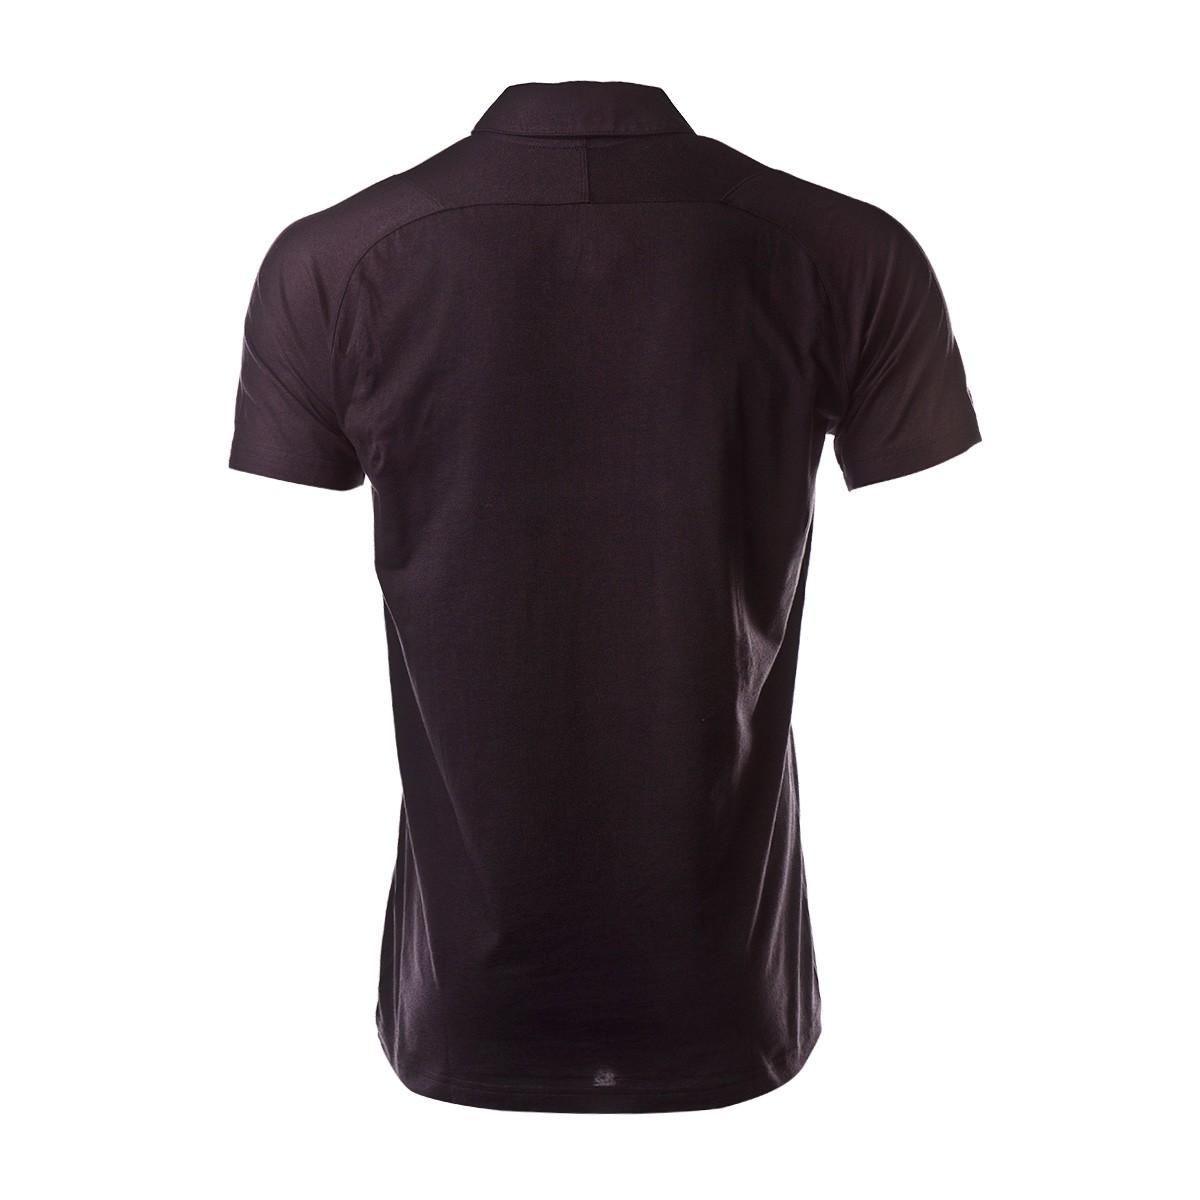 Puma Soccer Polo Shirts - Joe Maloy 1009c5e92